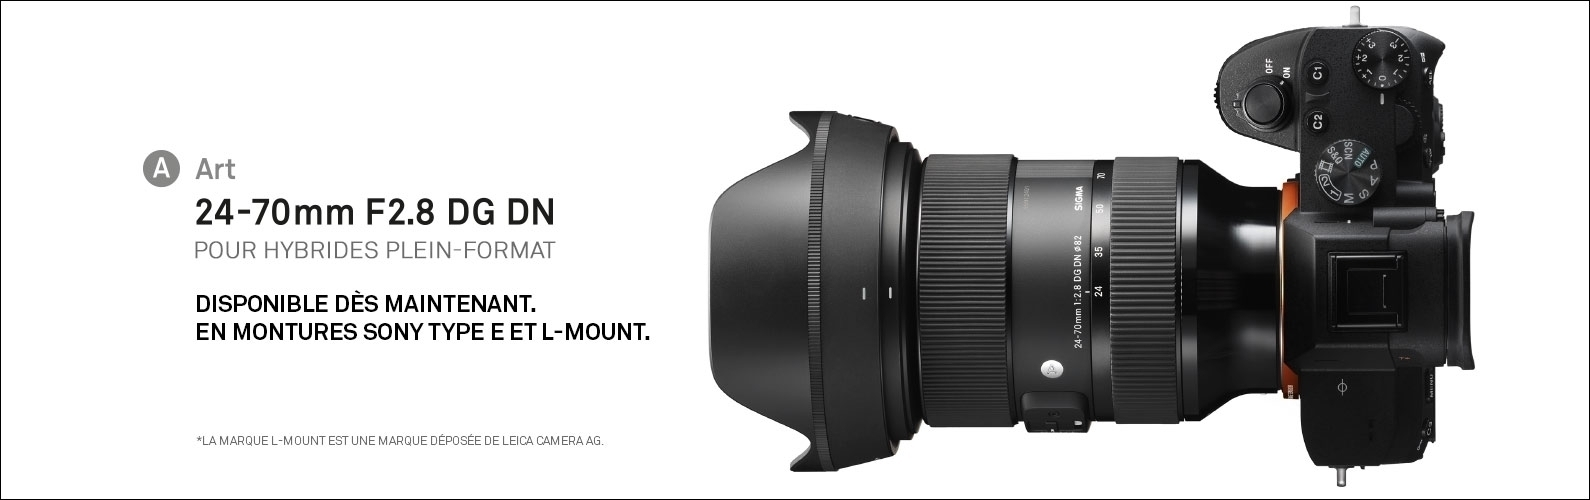 Objectif photo 24-70mm F2.8 DG DN